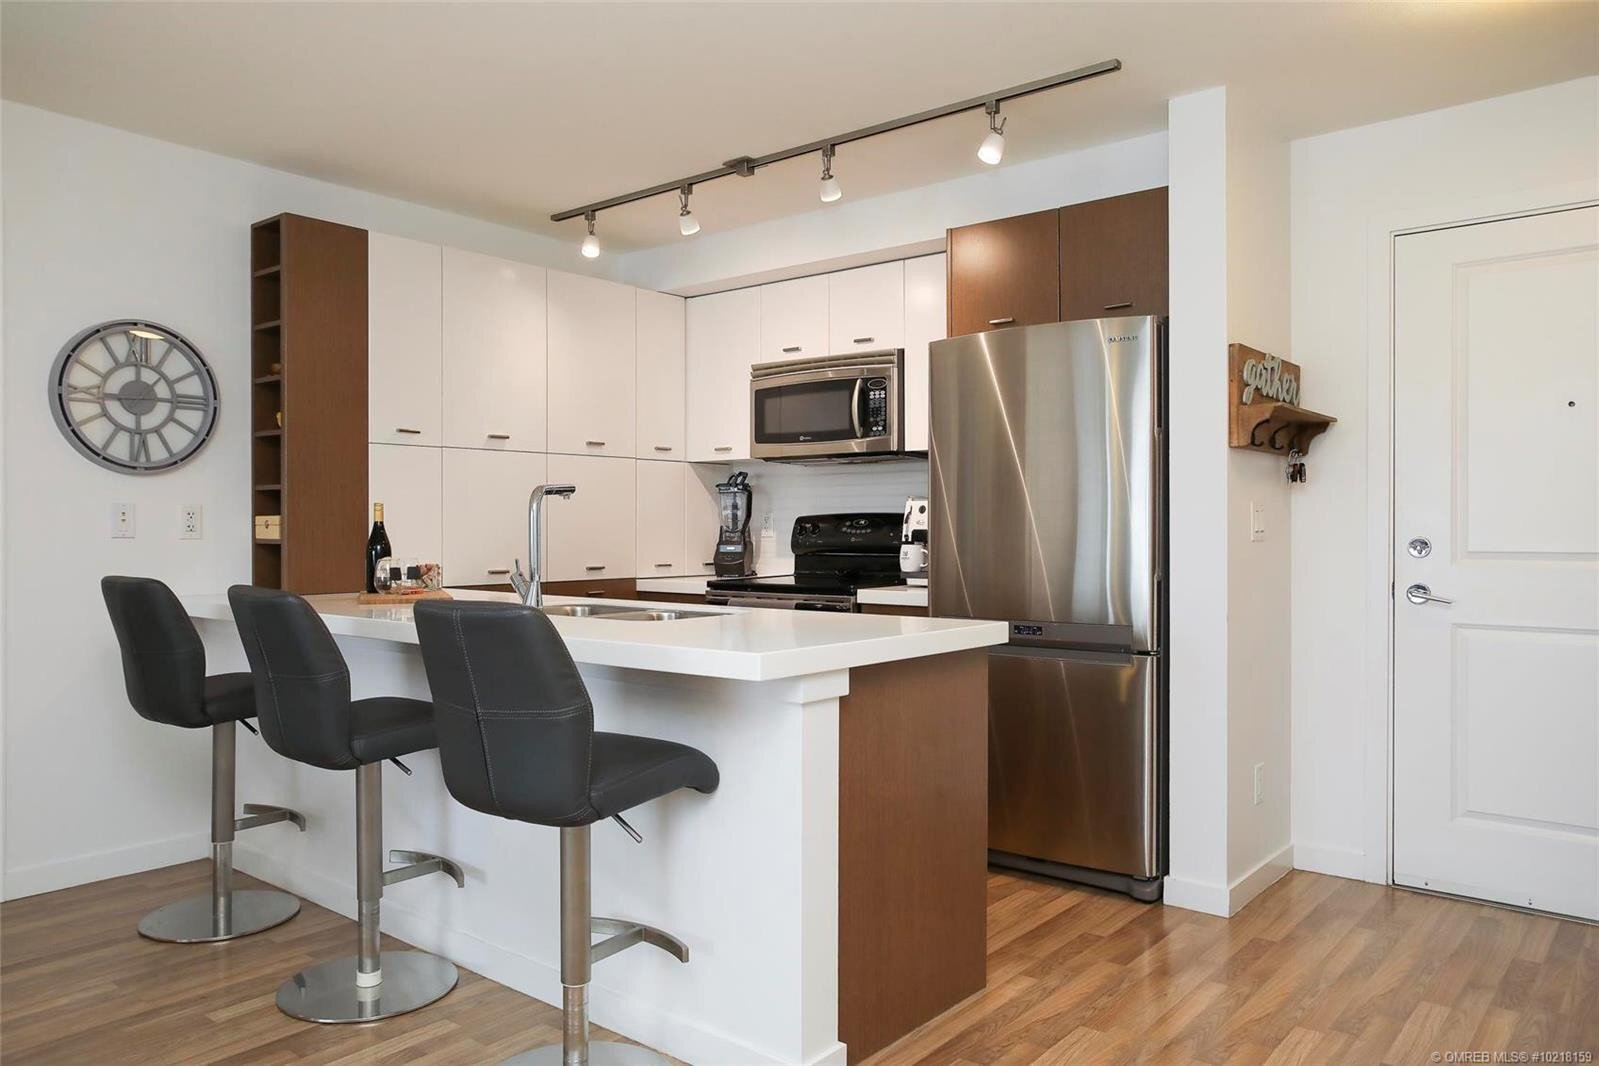 Condo for sale at 1550 Dickson Ave Unit 302 Kelowna British Columbia - MLS: 10218159